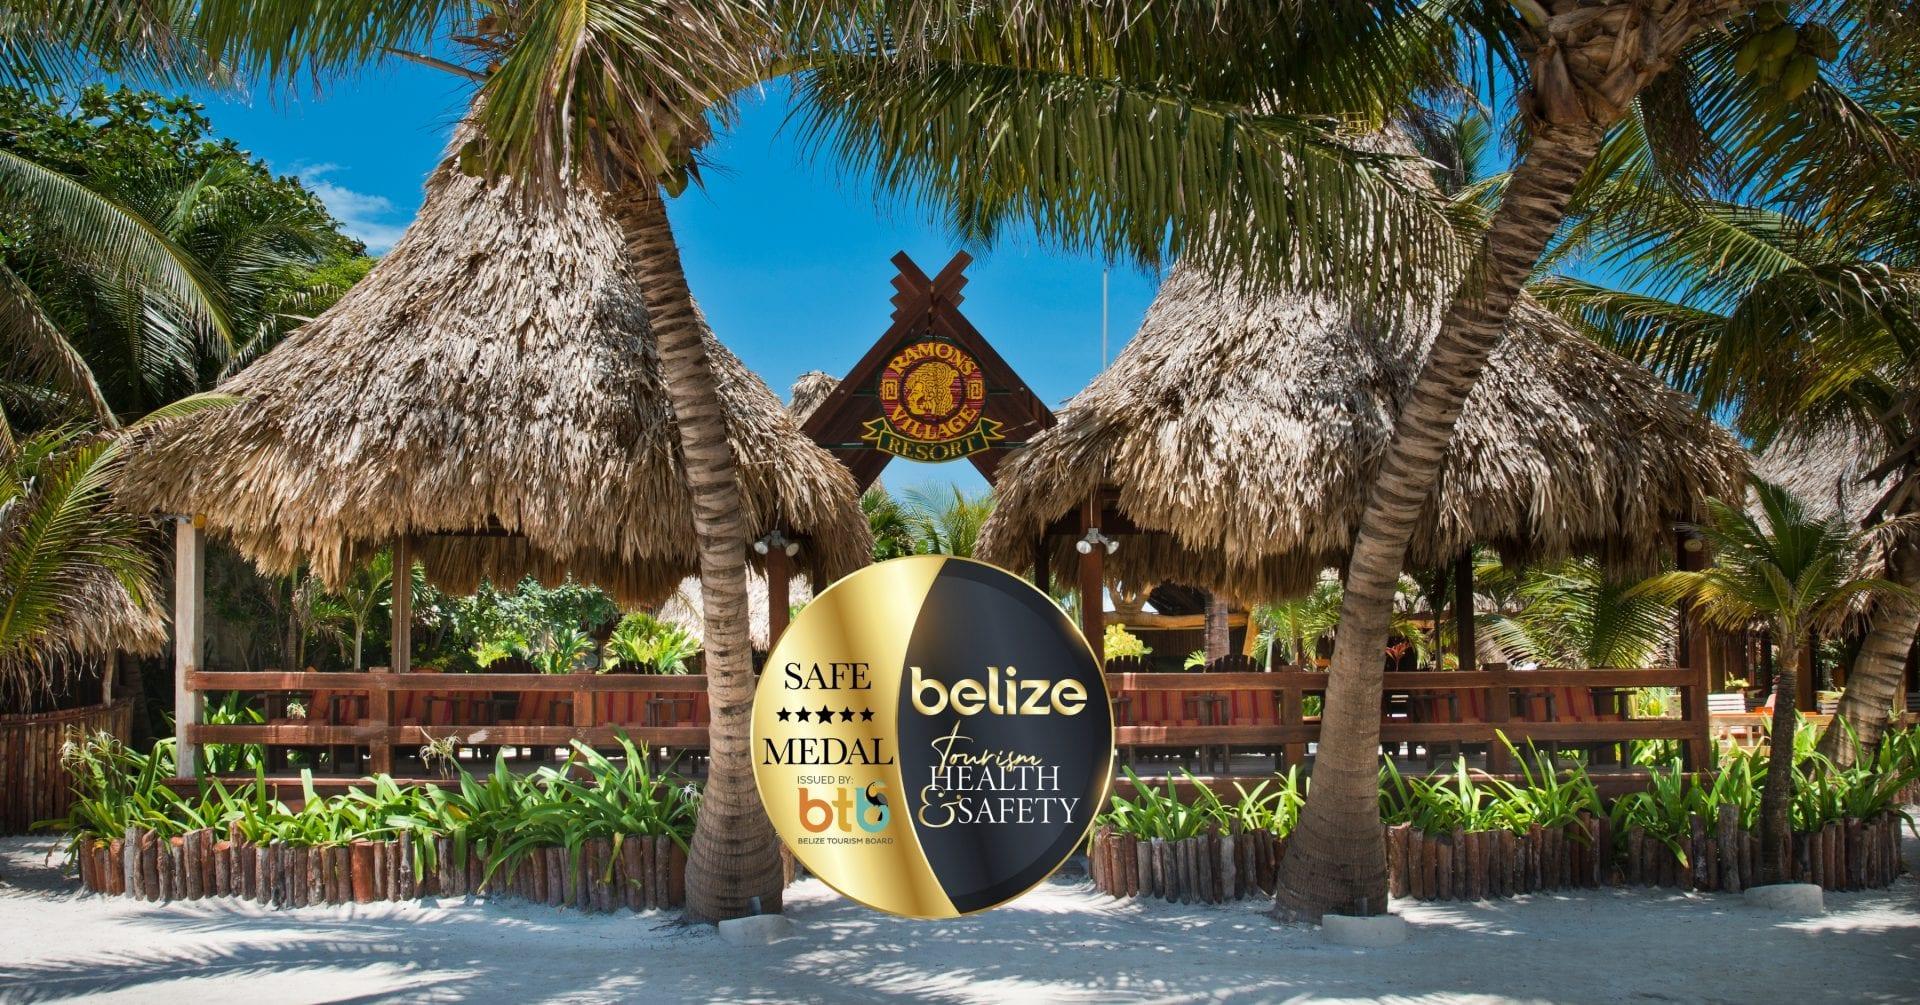 ramons village resort belize gold standard hotel